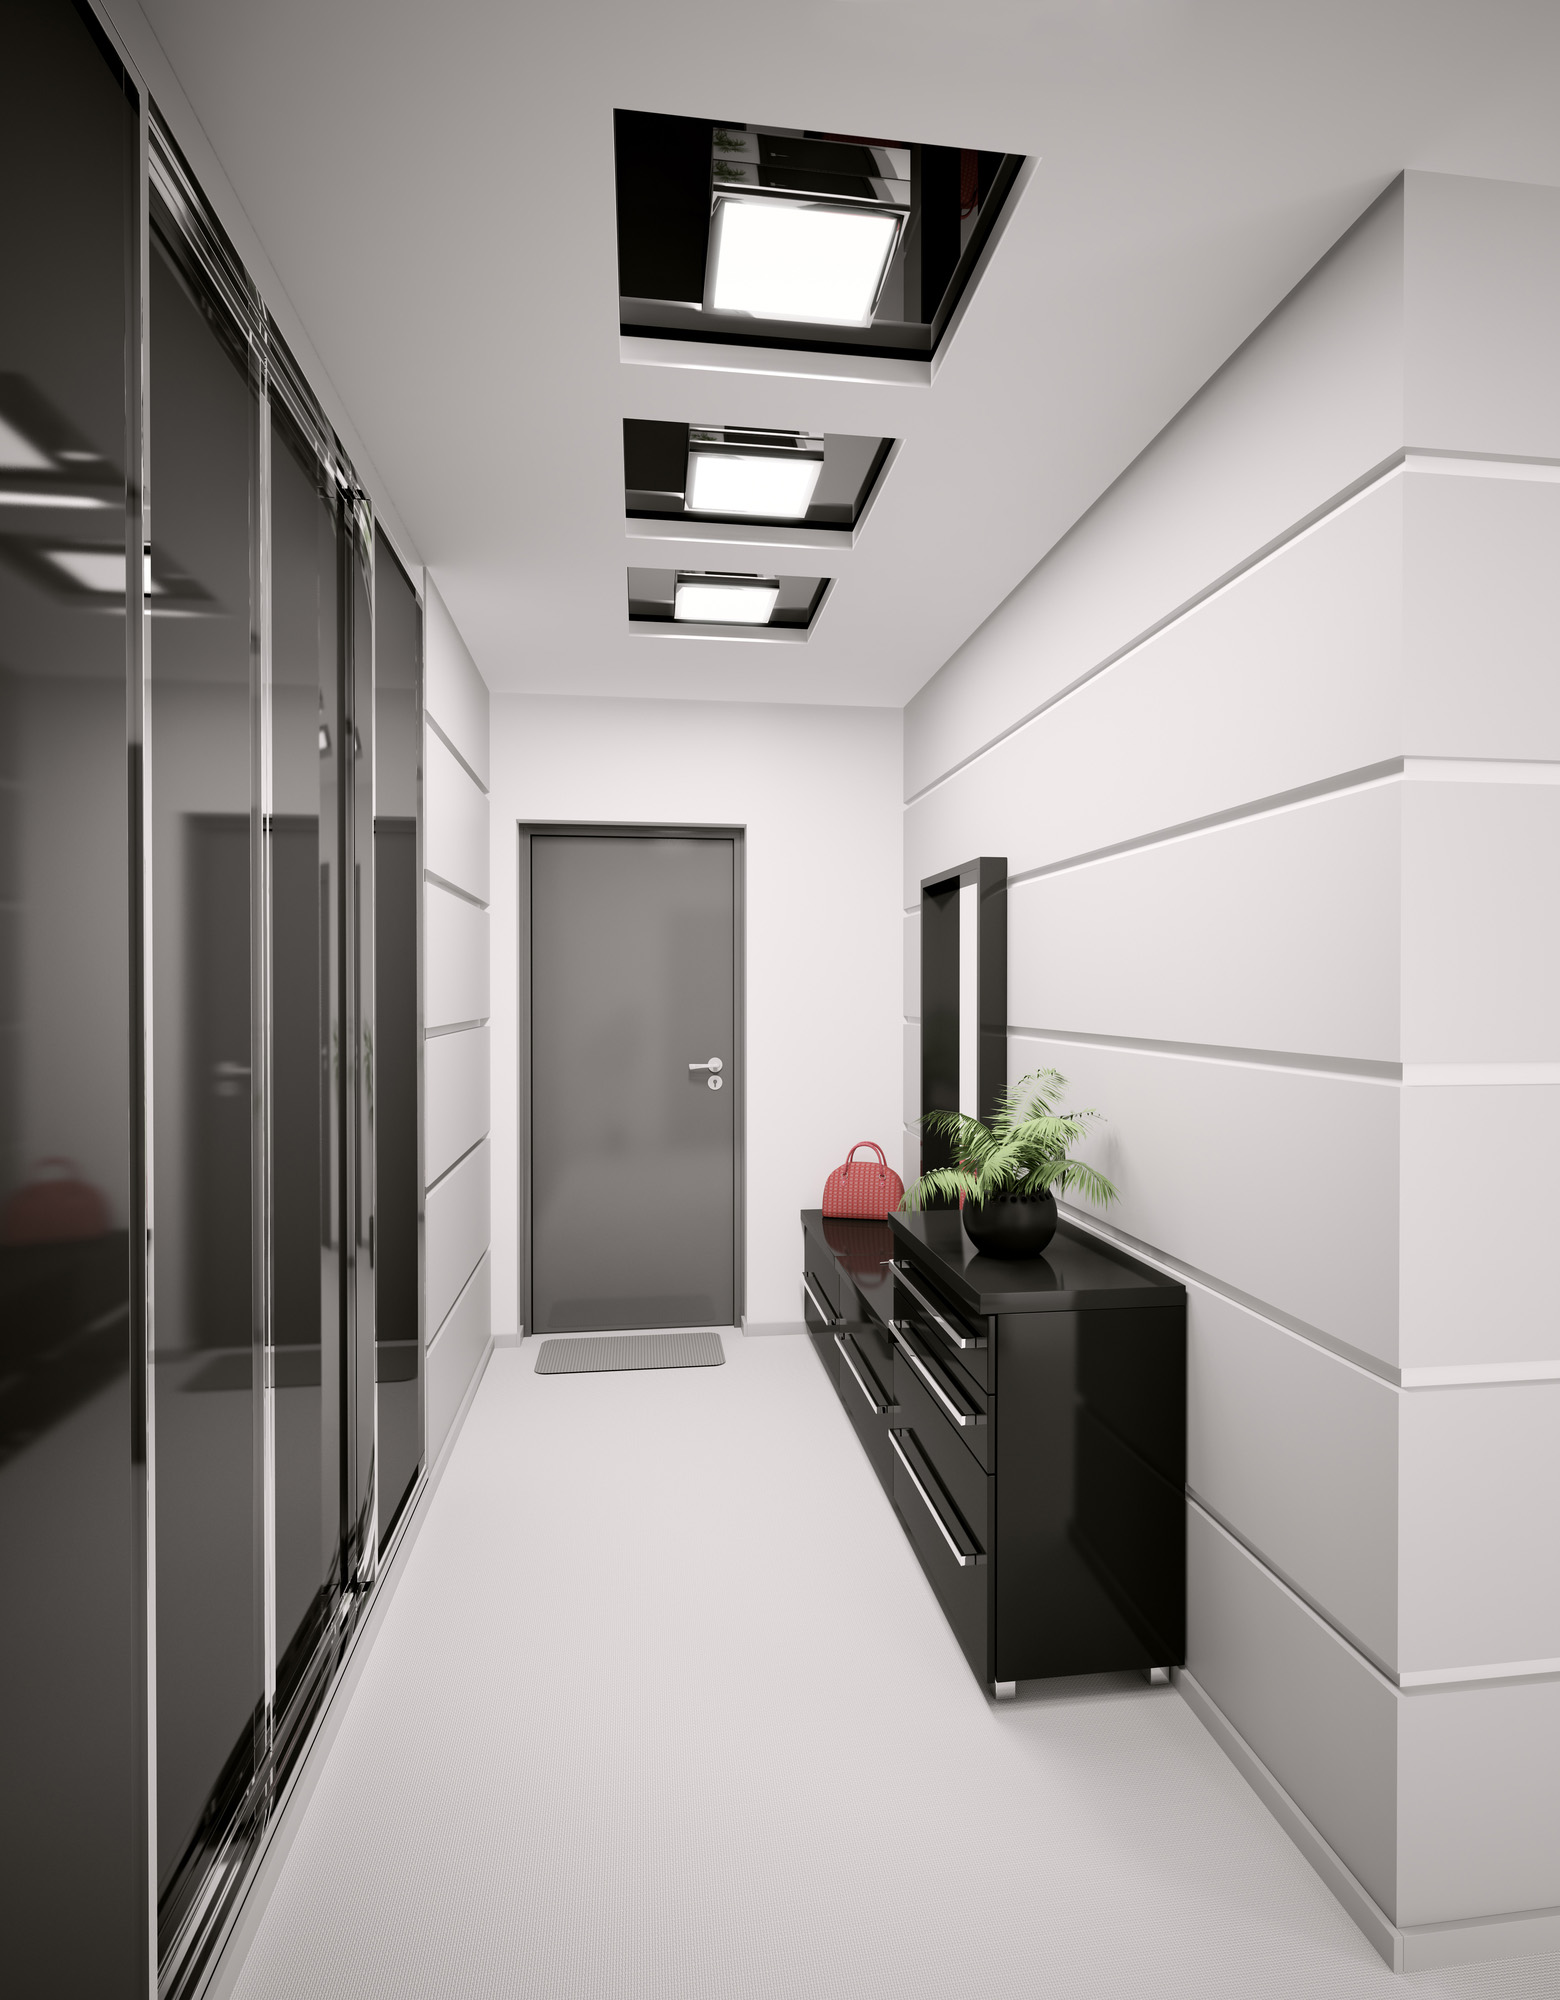 alcove wardrobes, modern bedroom ideas, white wardrobe, shaker wardrobe doors